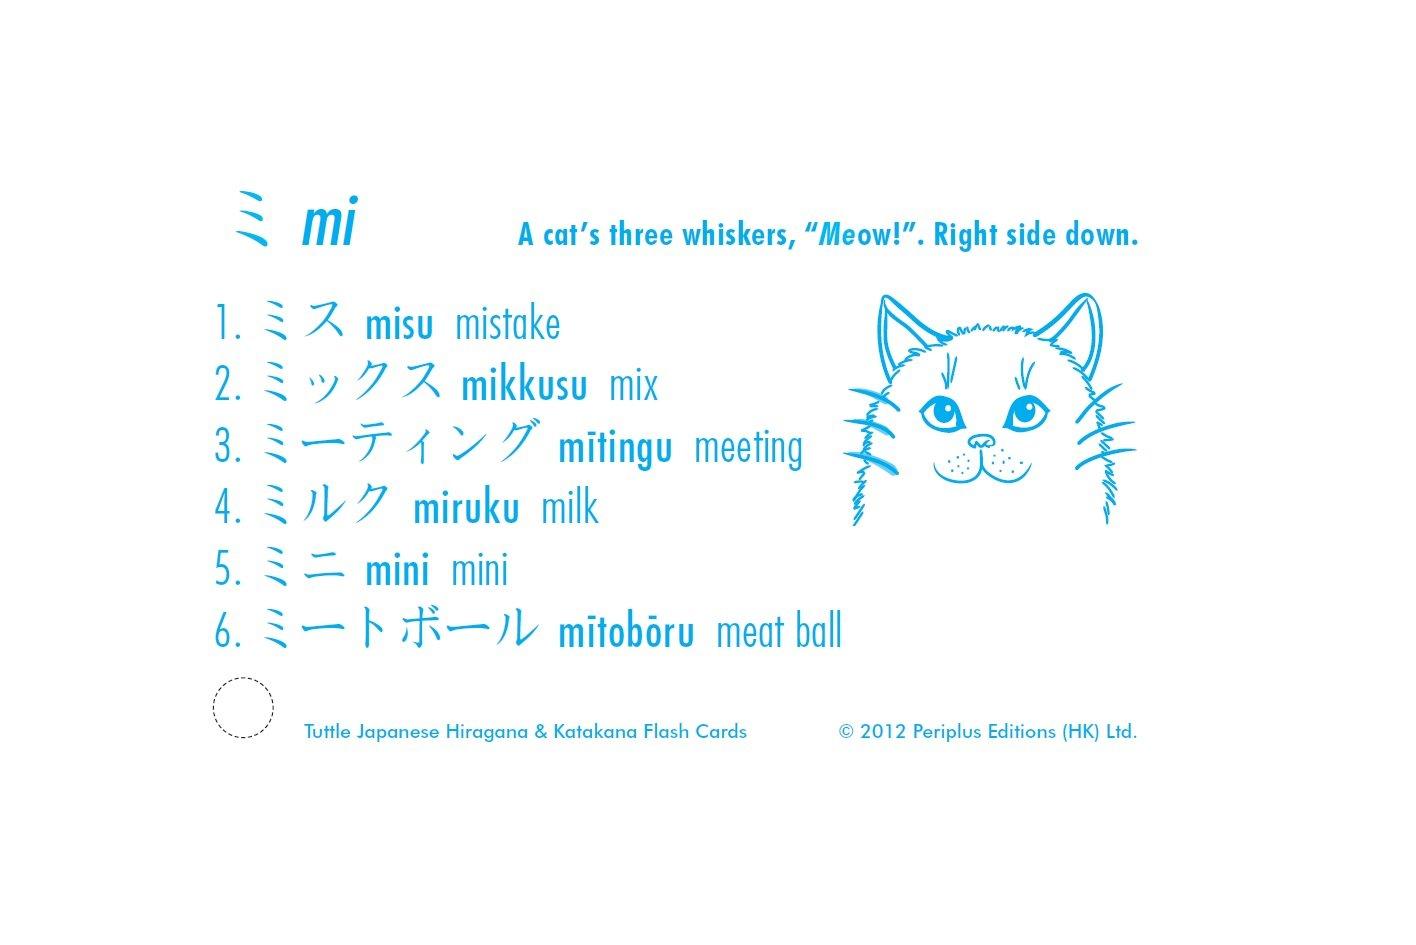 Amazon japanese hiragana and katakana flash cards kit learn amazon japanese hiragana and katakana flash cards kit learn the two japanese alphabets quickly easily with this japanese flash cards kit audio cd biocorpaavc Gallery